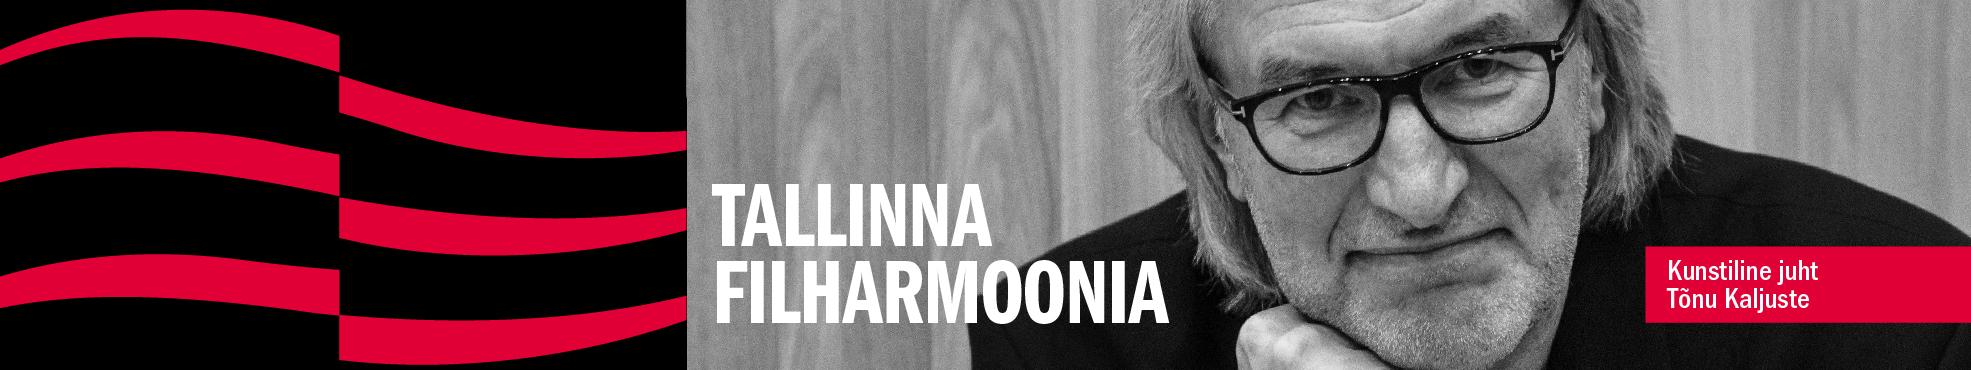 FILHARMOONIA 2020